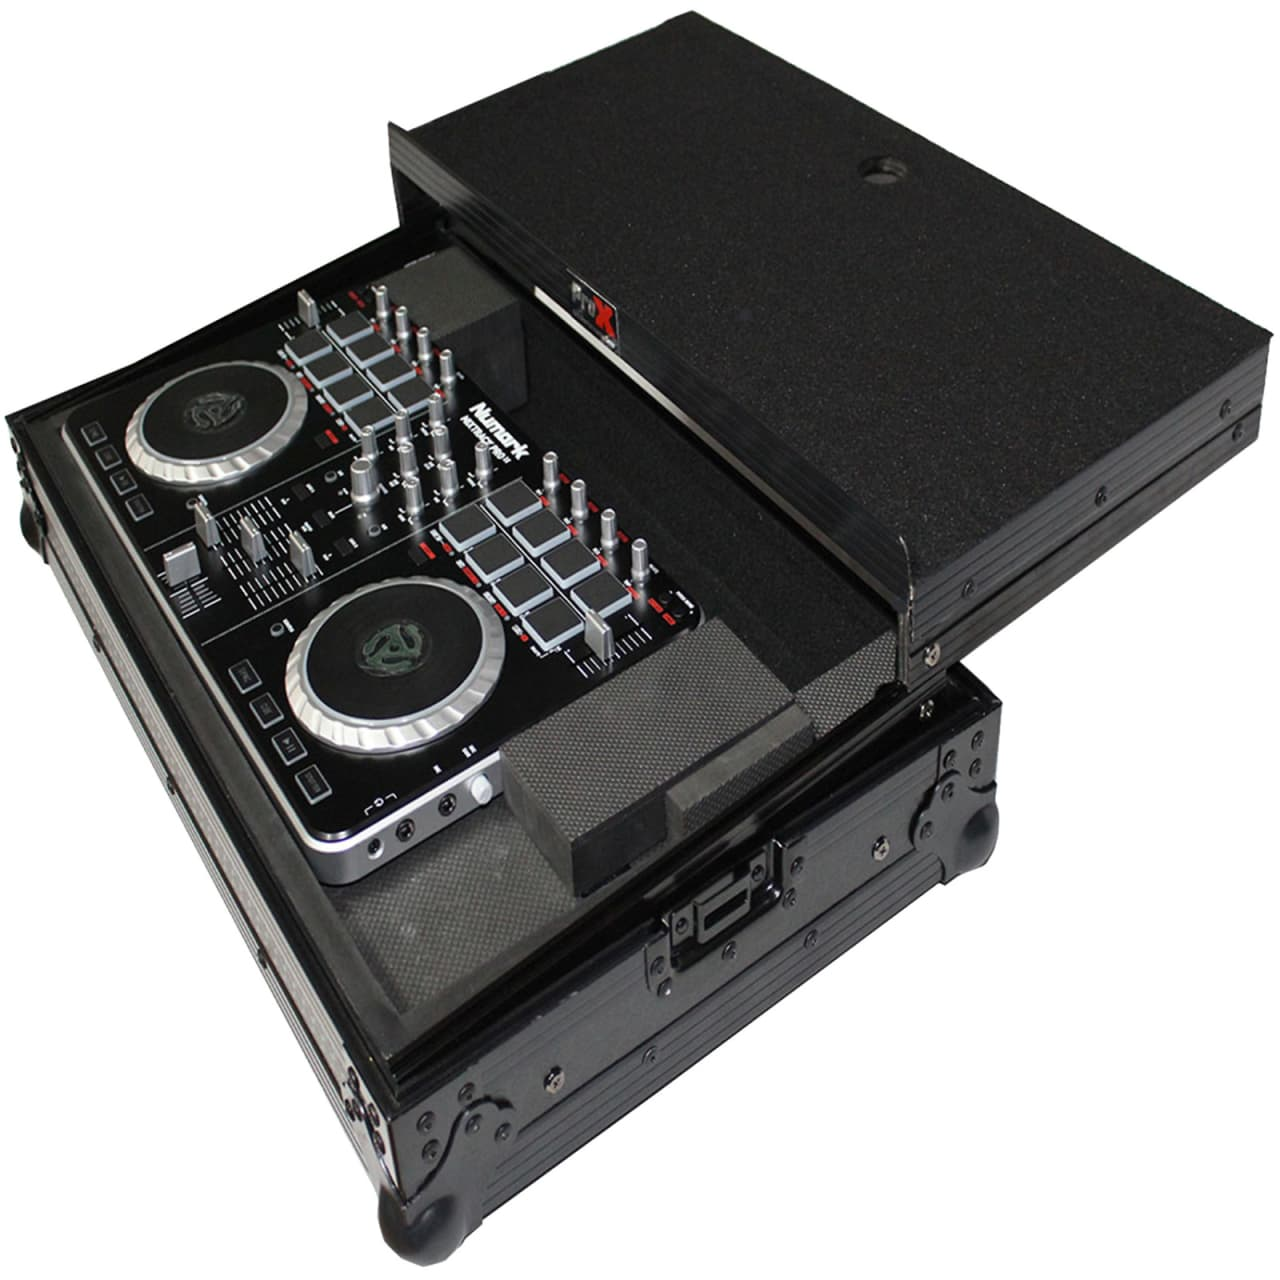 prox x mxtsbltbl black hard case pioneer ddj sb numark. Black Bedroom Furniture Sets. Home Design Ideas